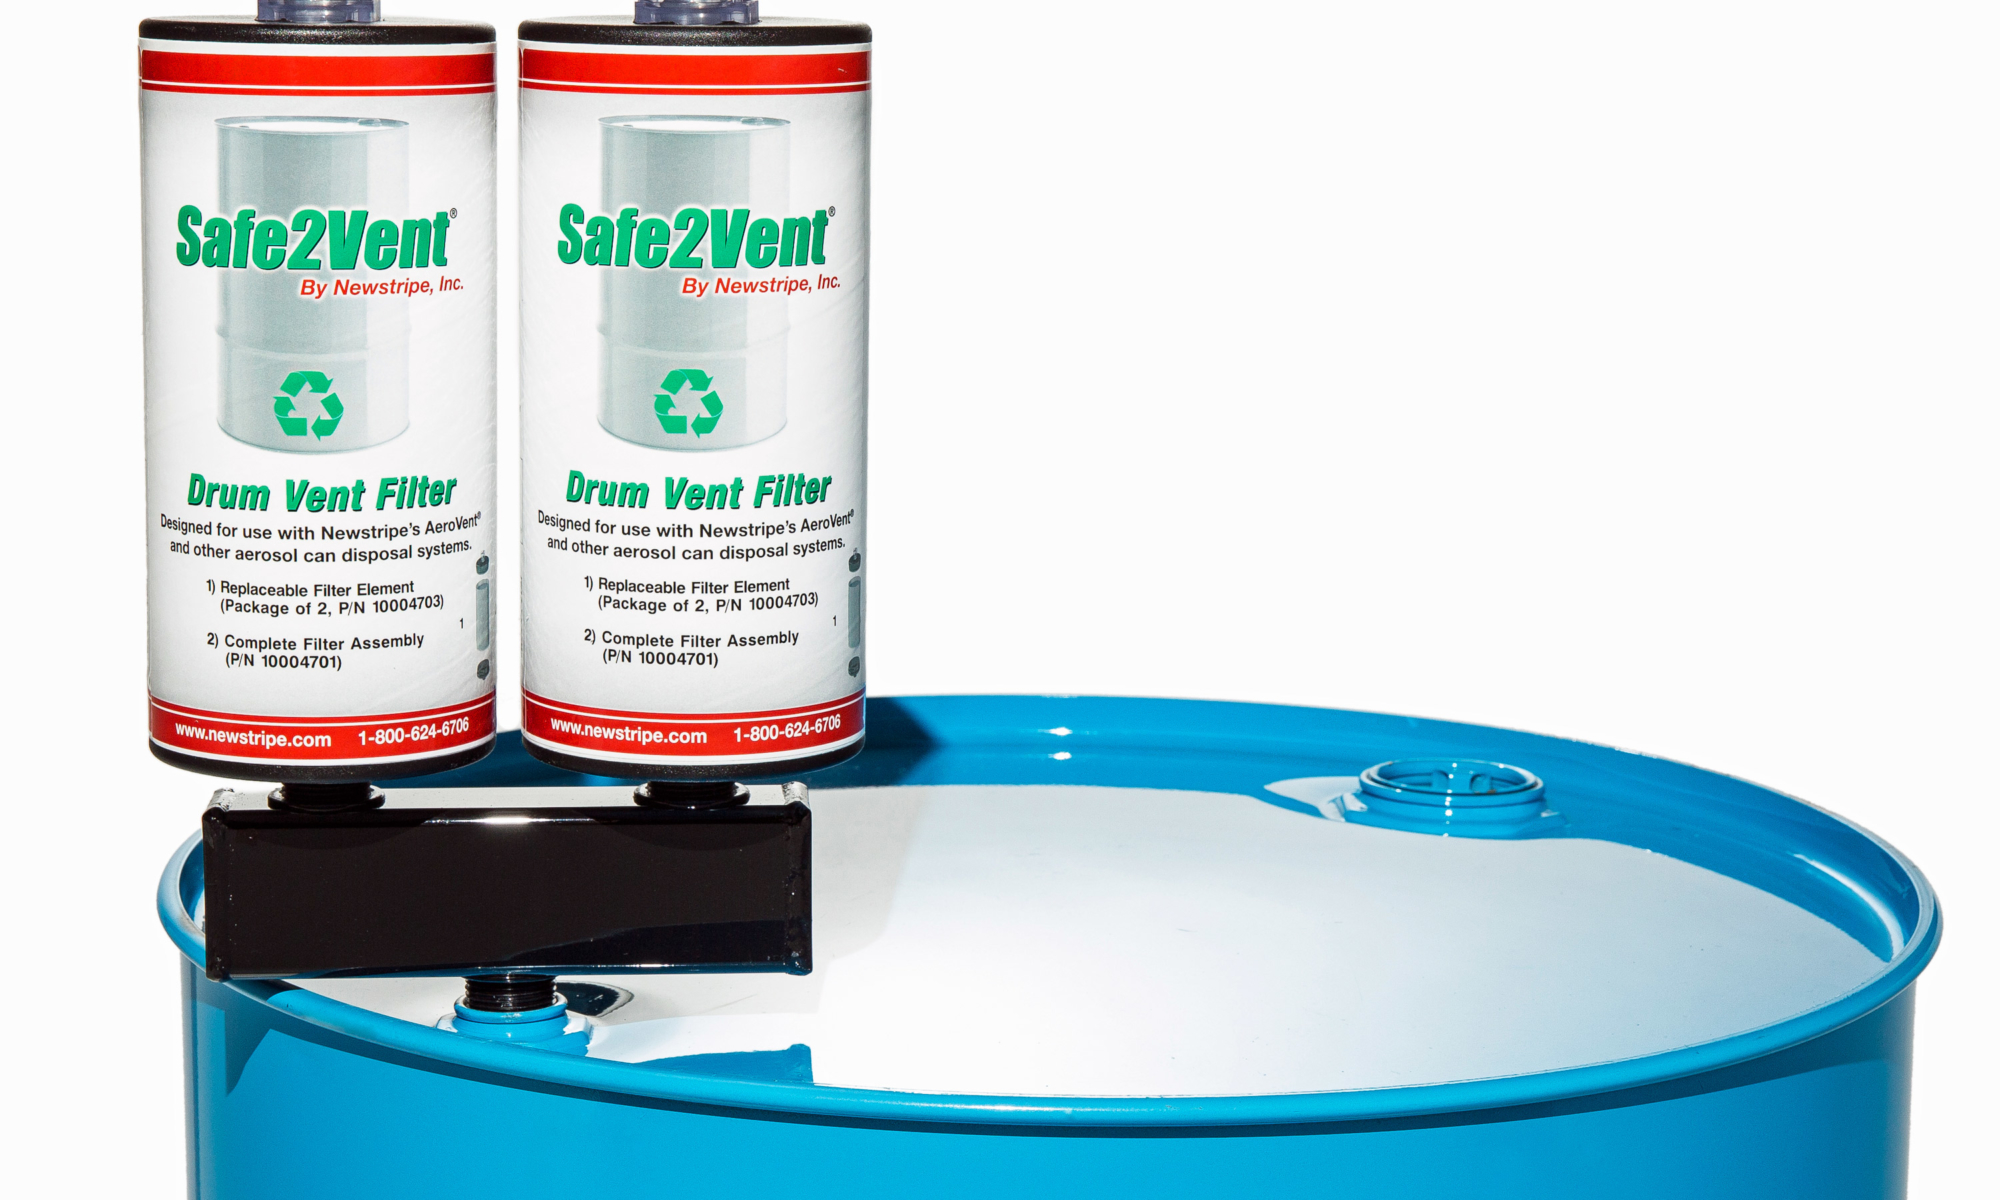 Safe2Vent Dual Filter Assembly